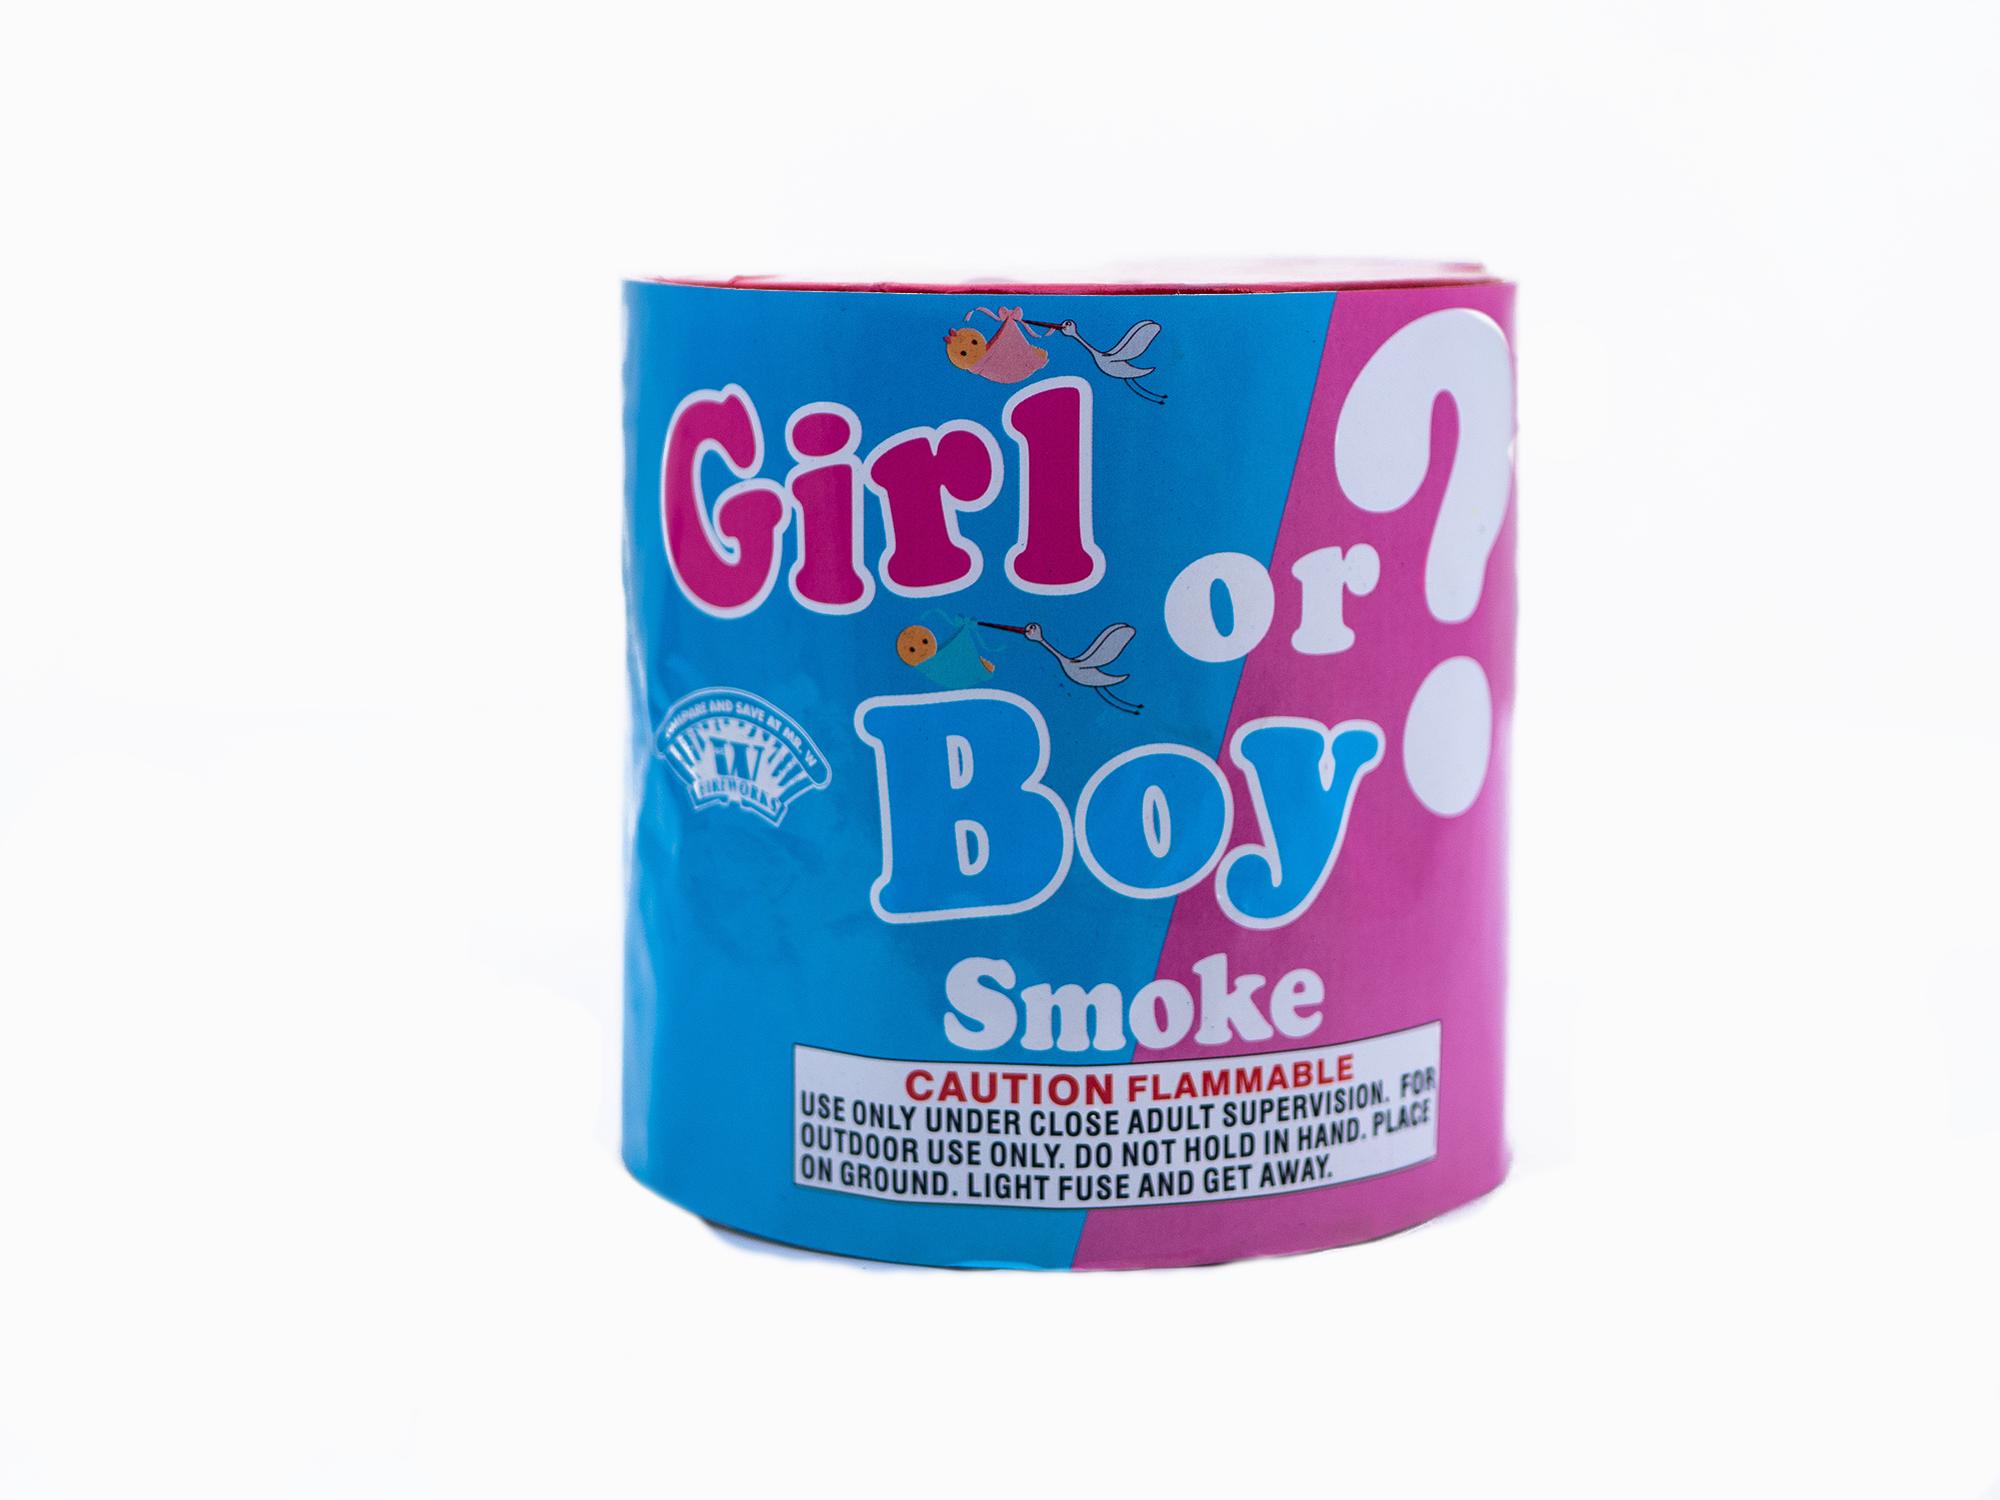 Boy or Girl Smoke